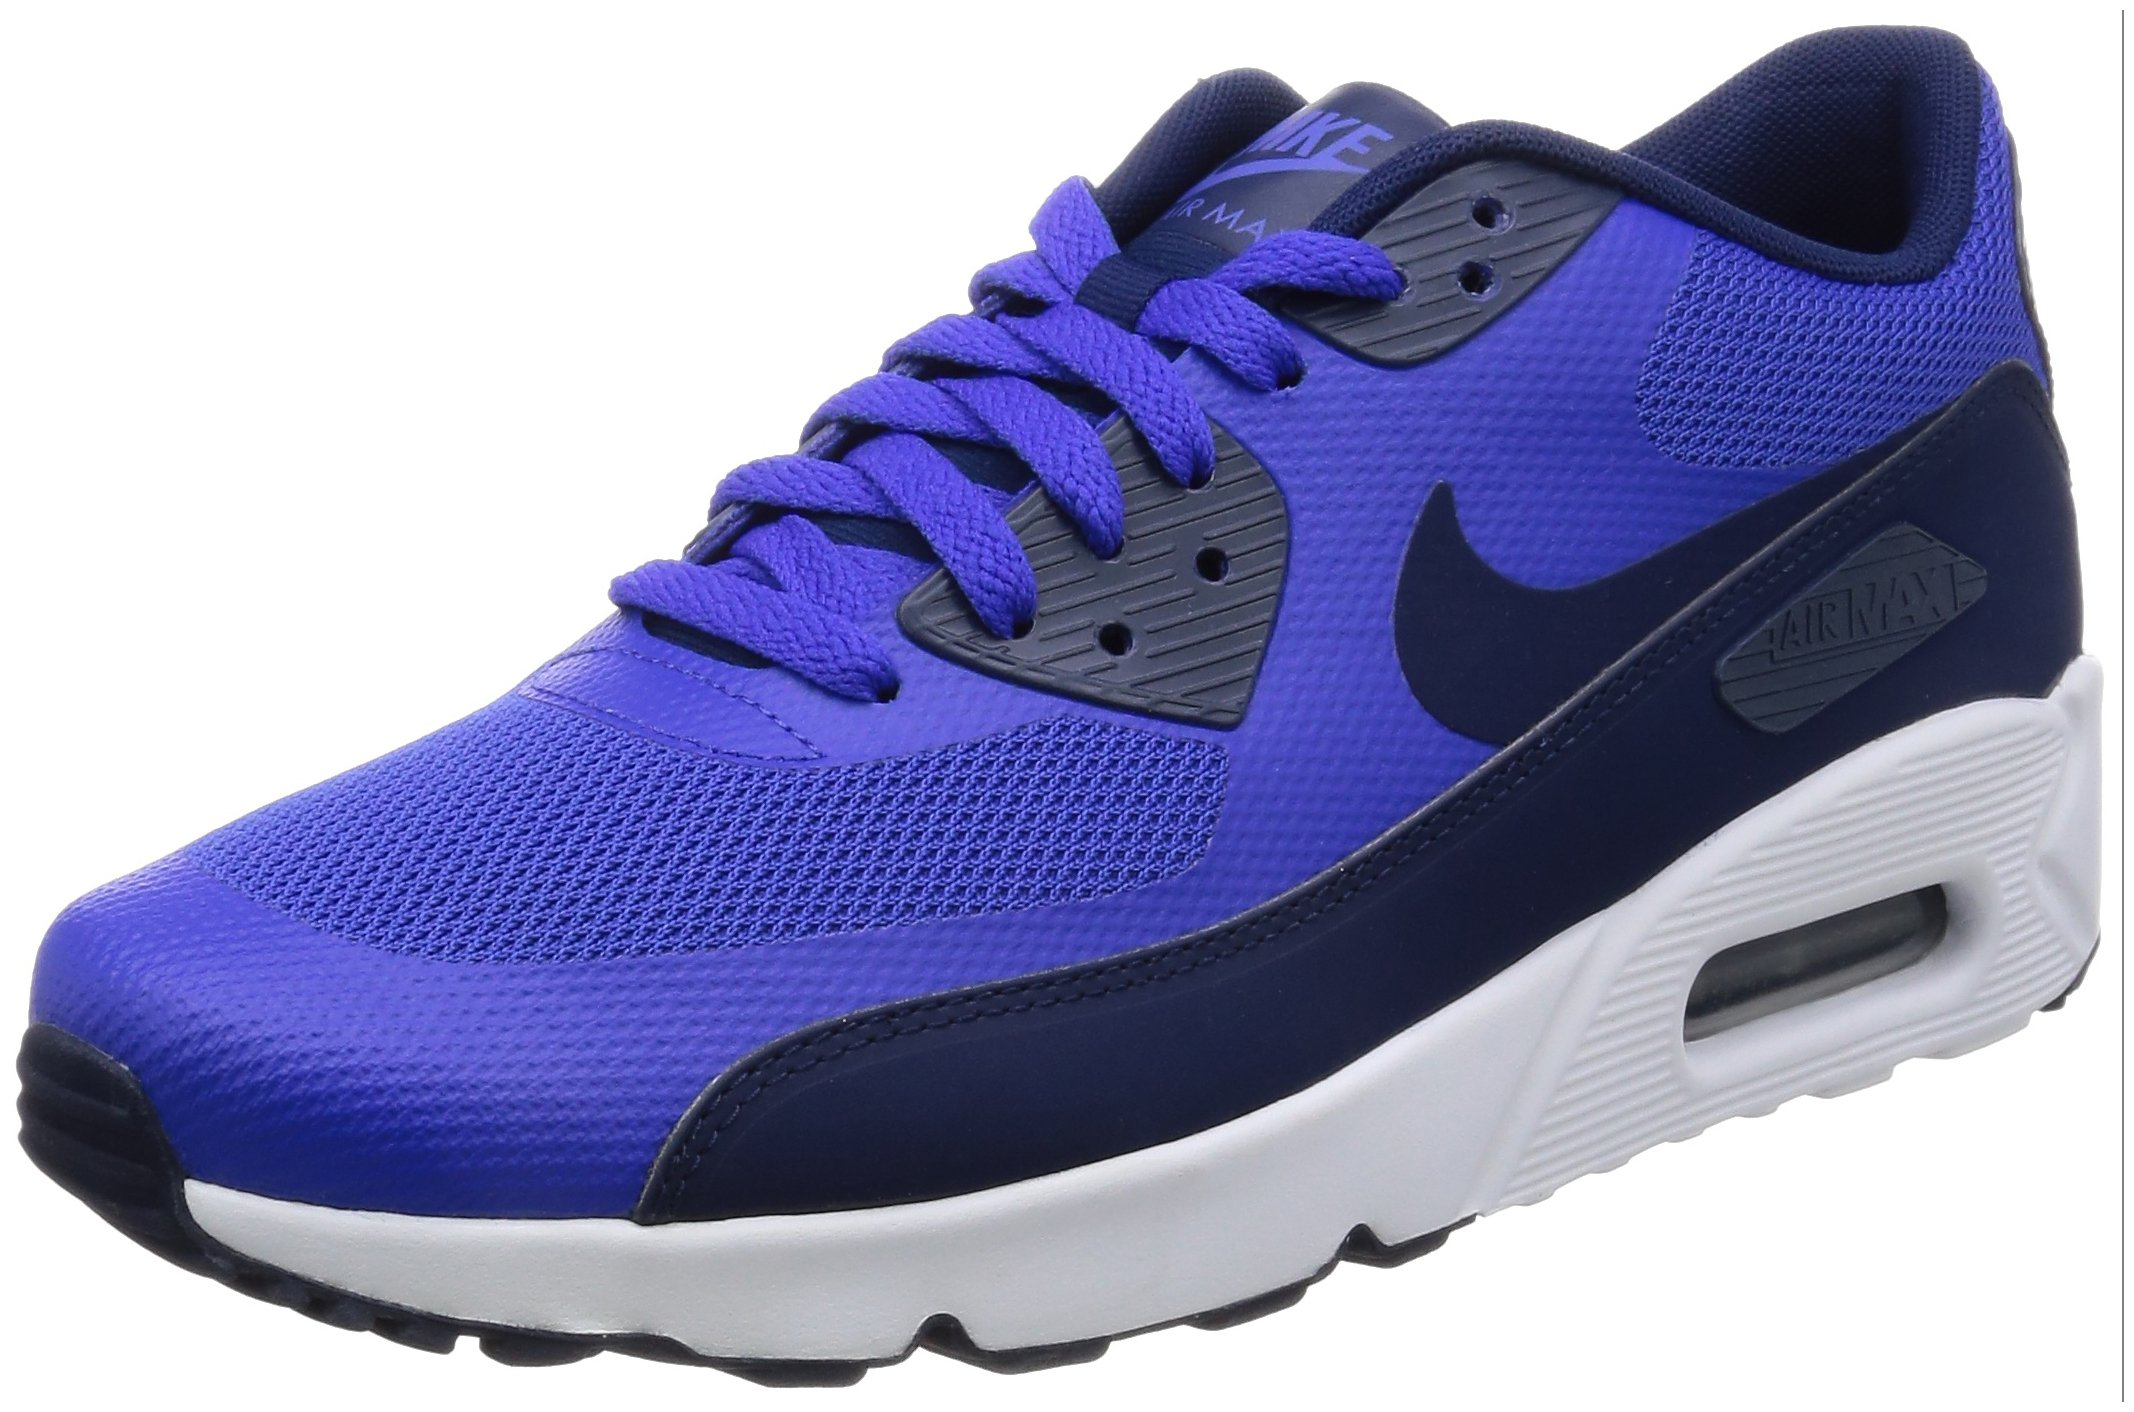 Ultra Binary Eu HommeBleuparamount 0 EssentialChaussures De Nike white44 Running 2 Air 90 5 Max Blue Yf6y7bg